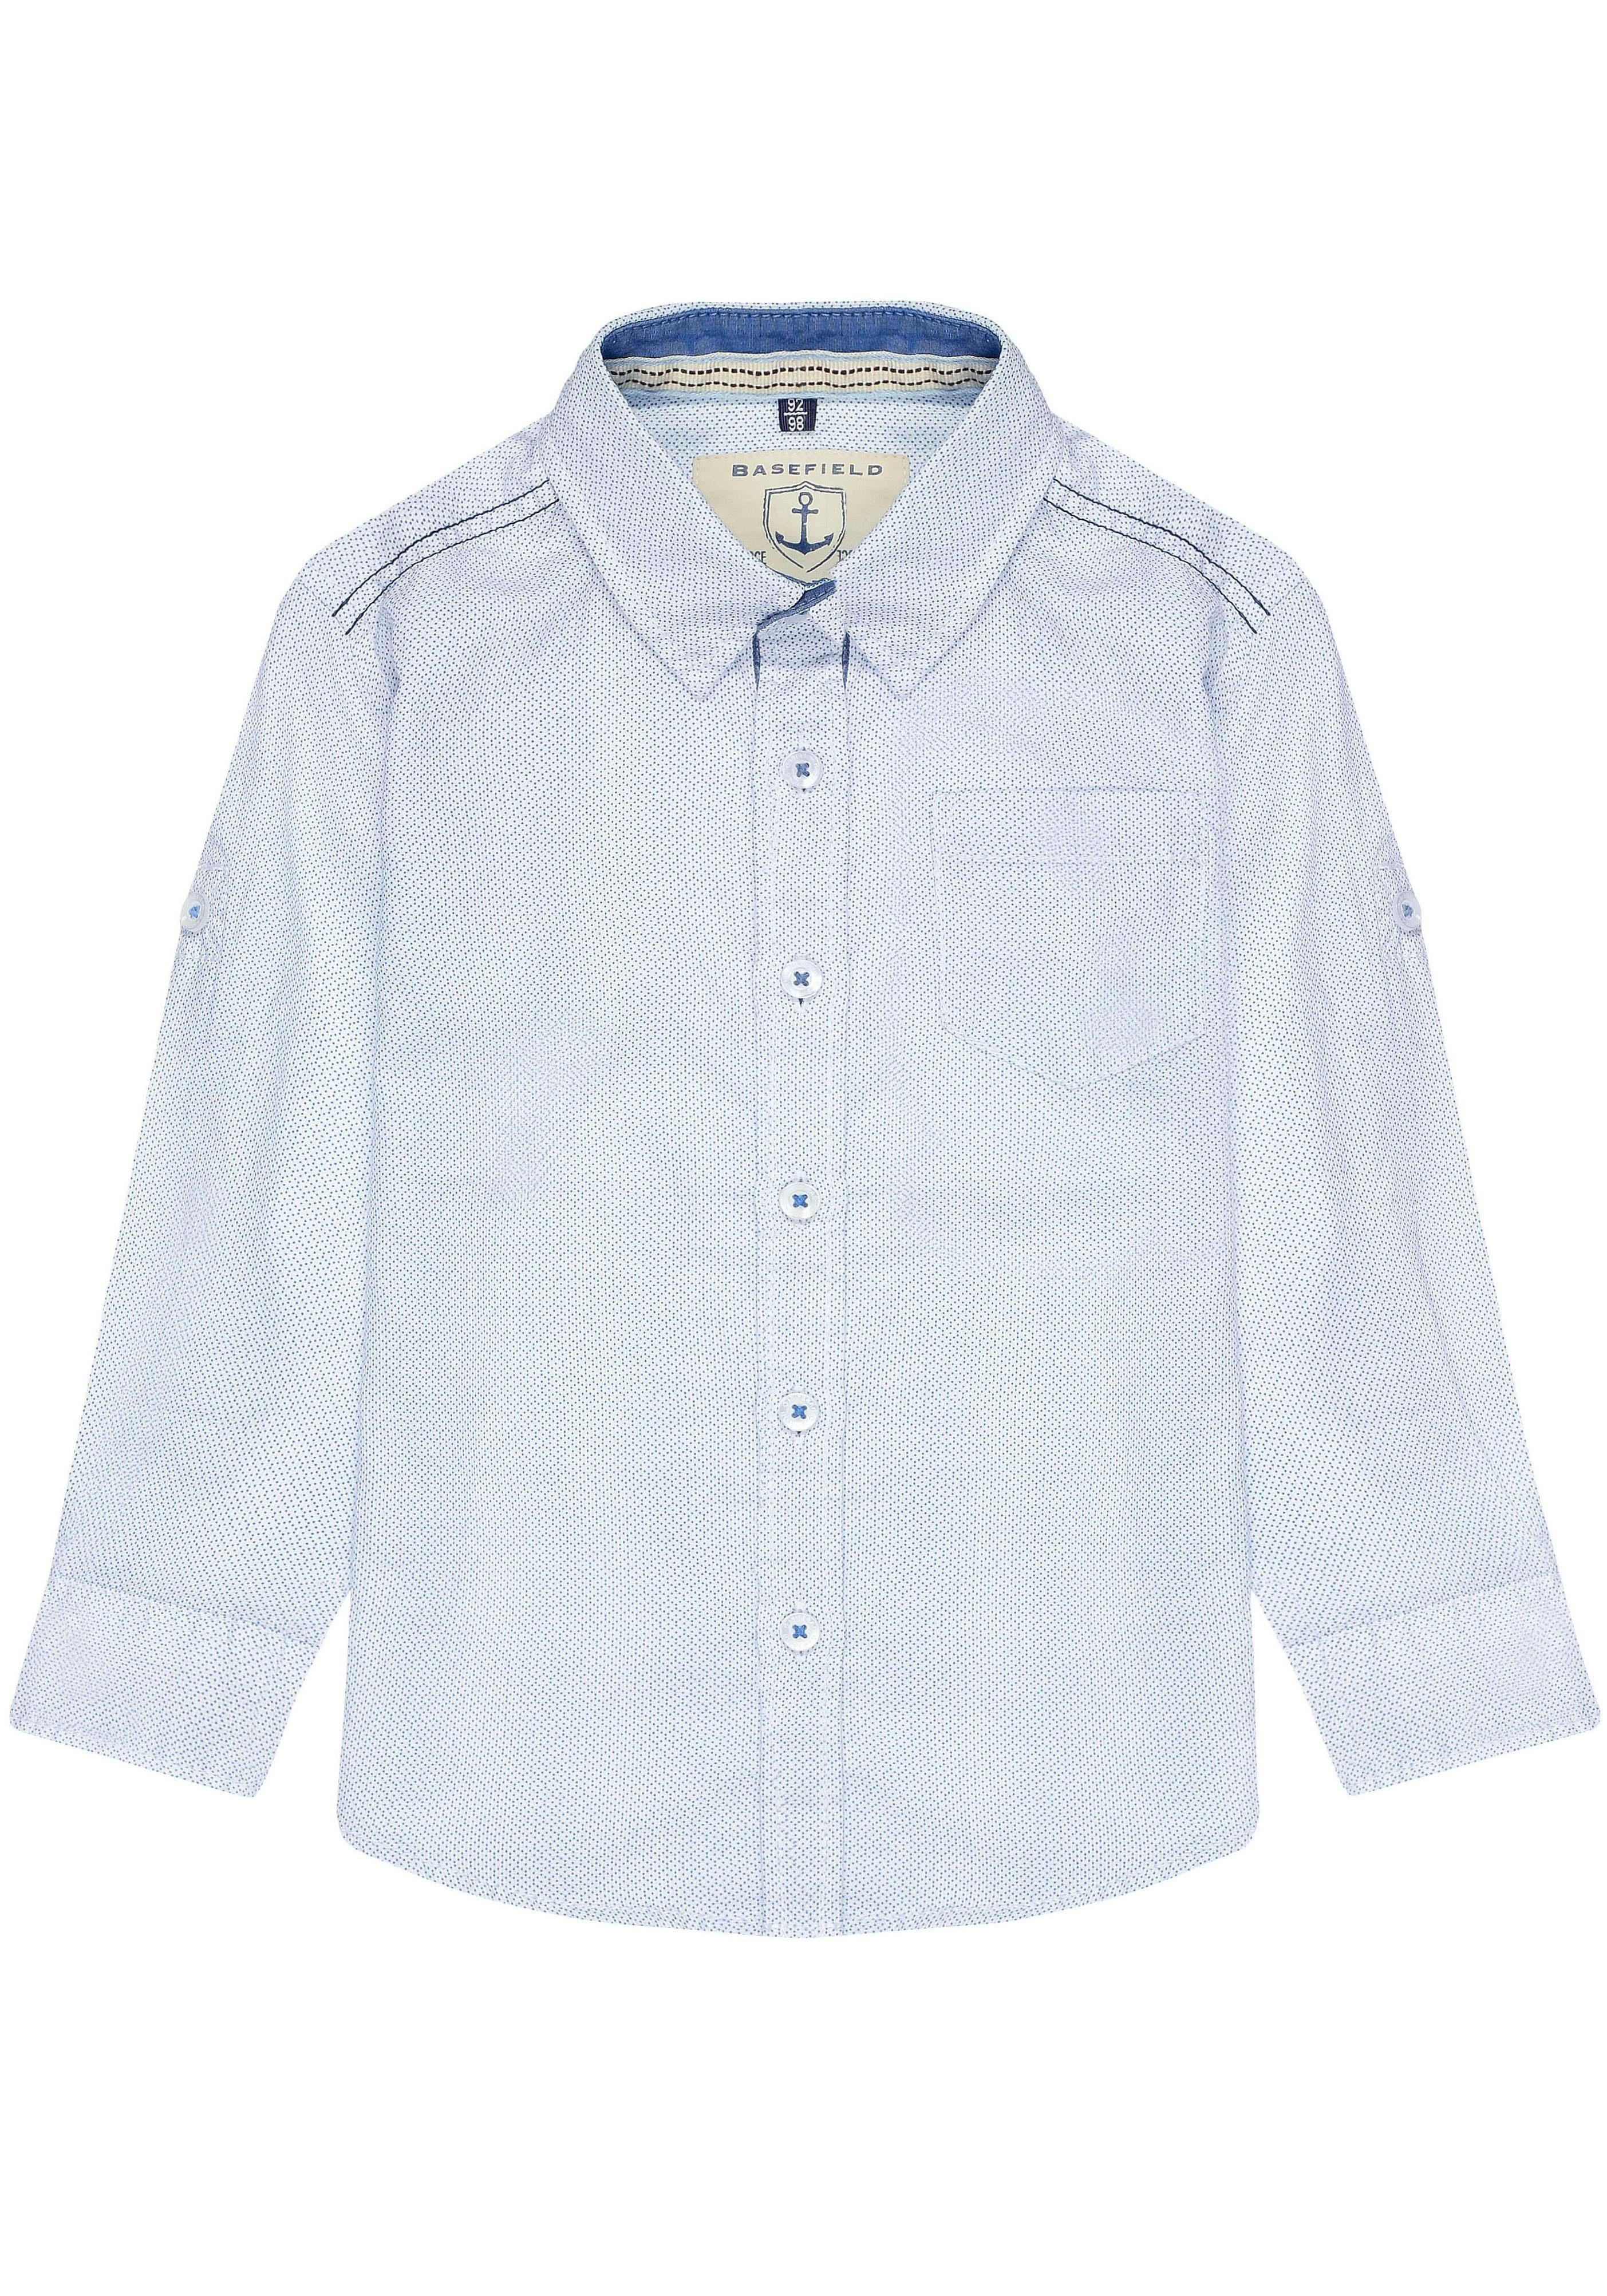 BASEFIELD Hemd